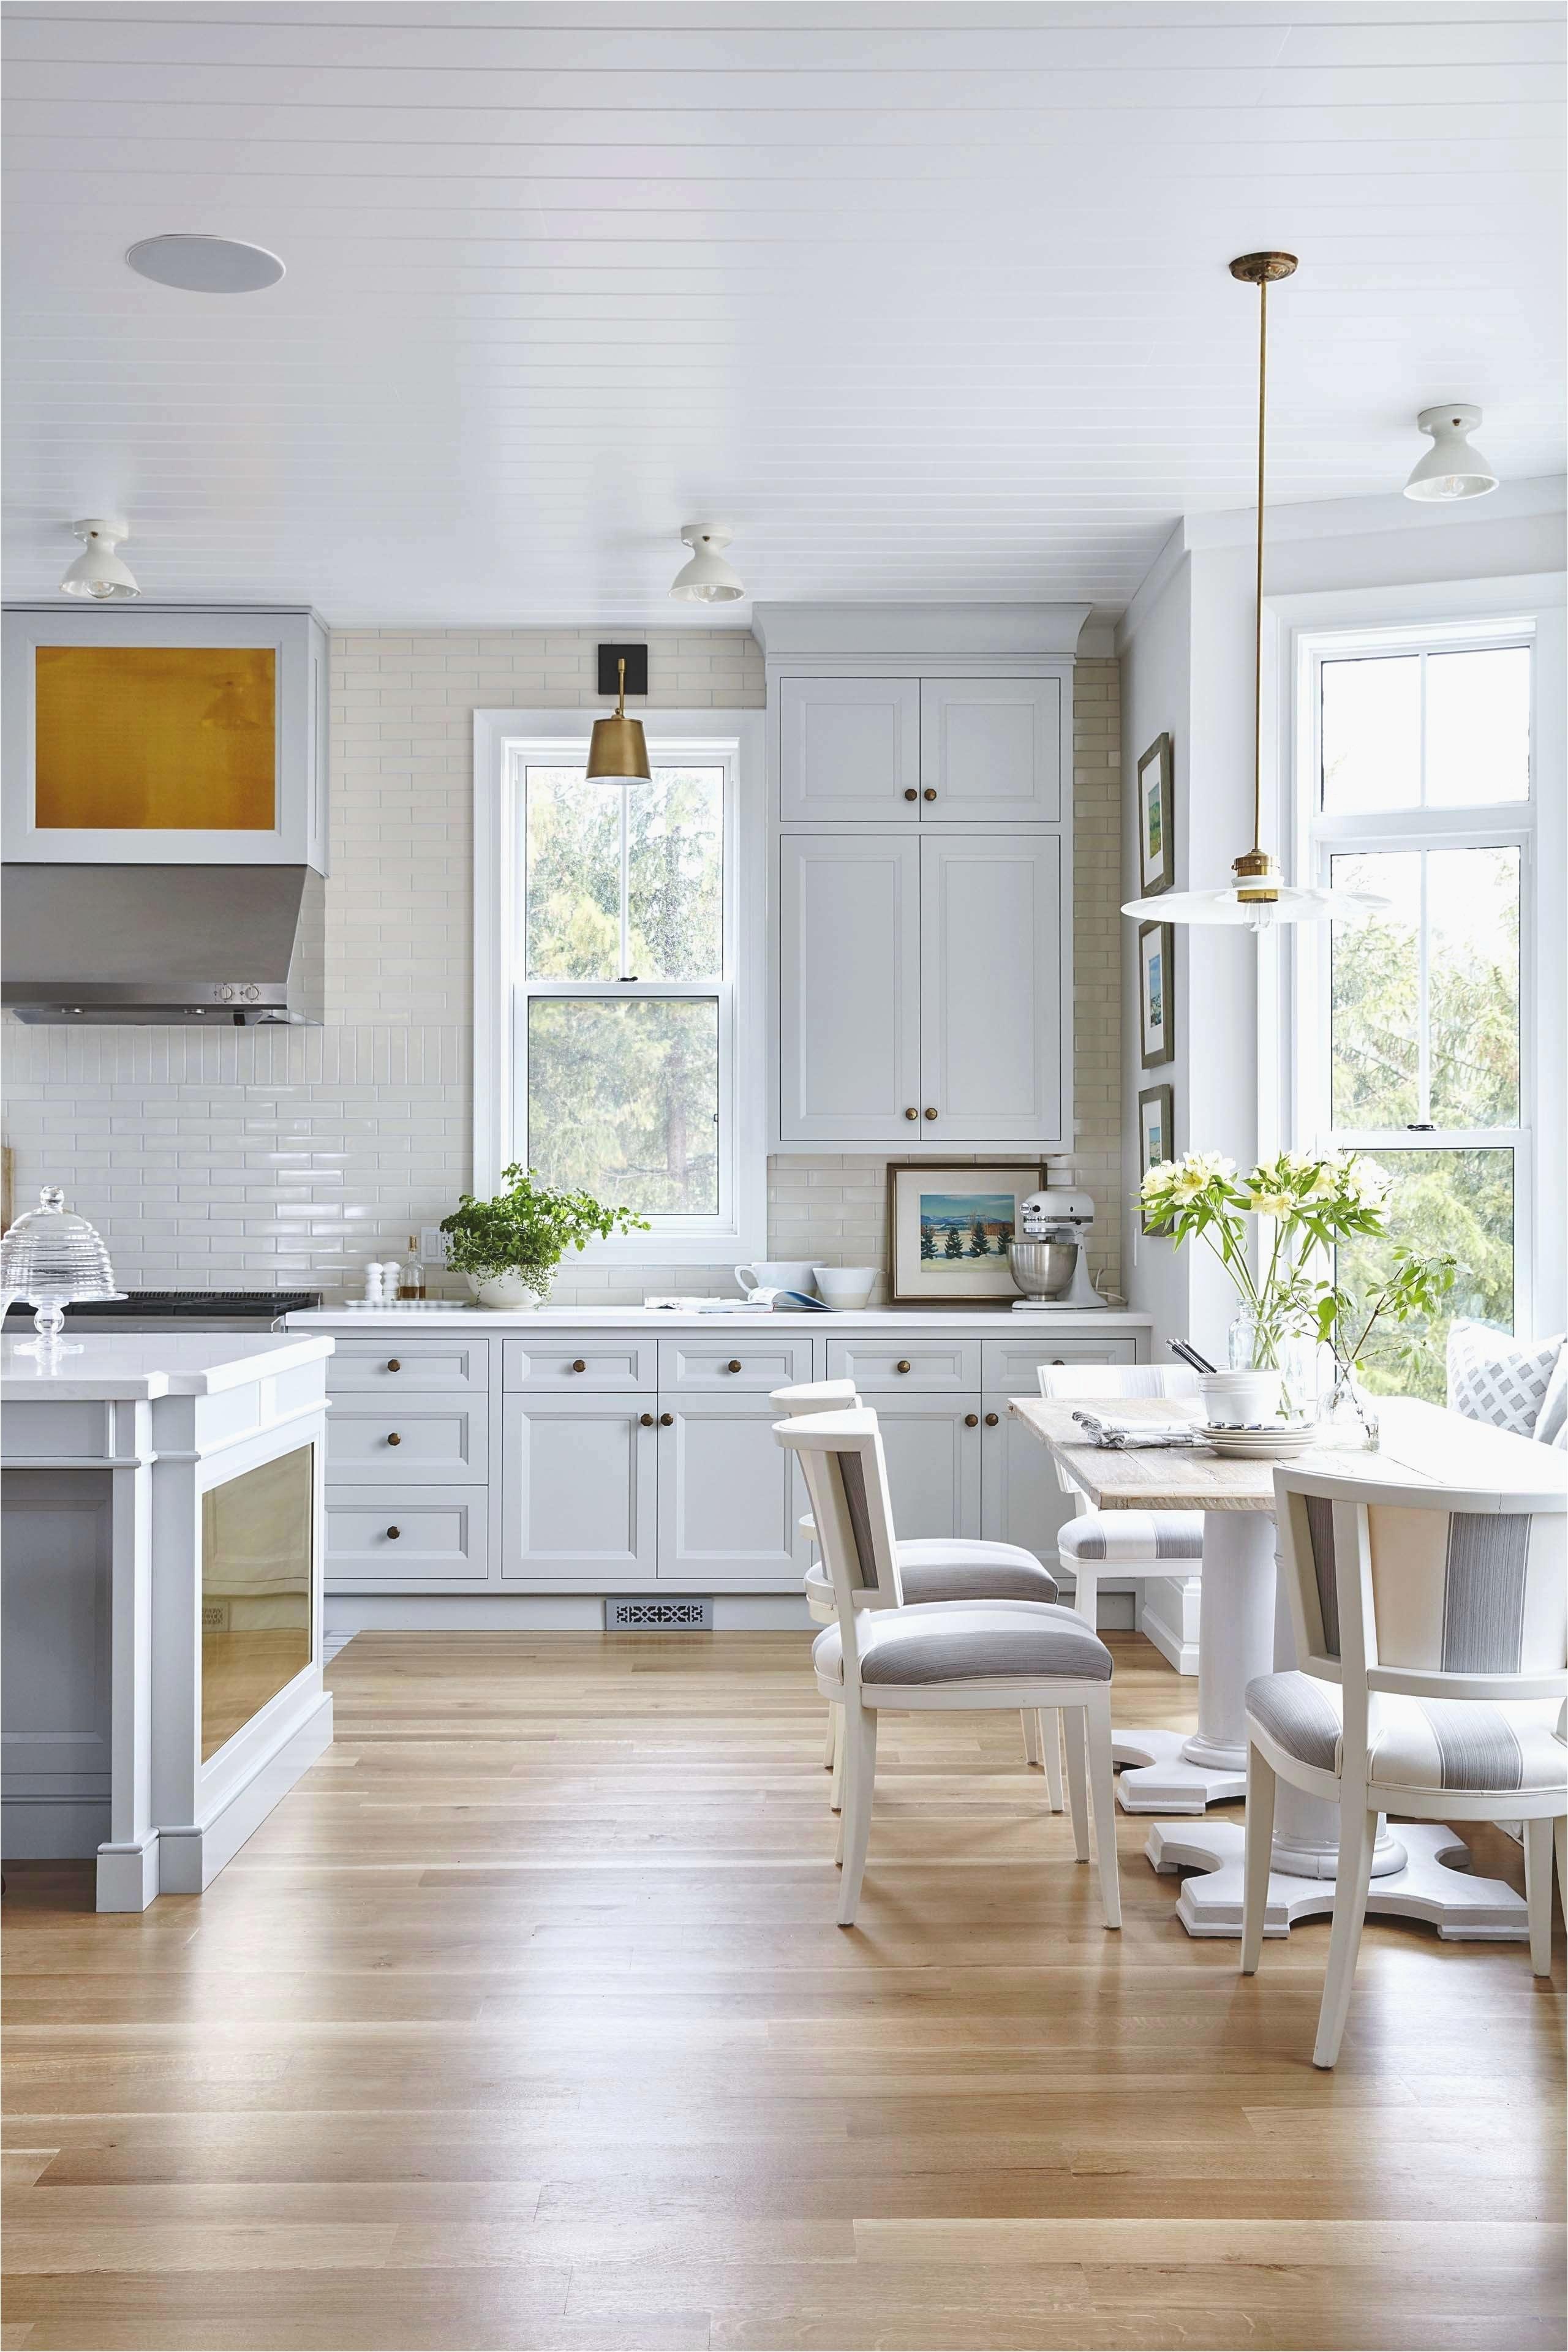 Country Kitchen Pantry Cabinet Elegant Kitchen Joys Kitchen Joys Kitchen 0d' Kitchens Design Ideas Design